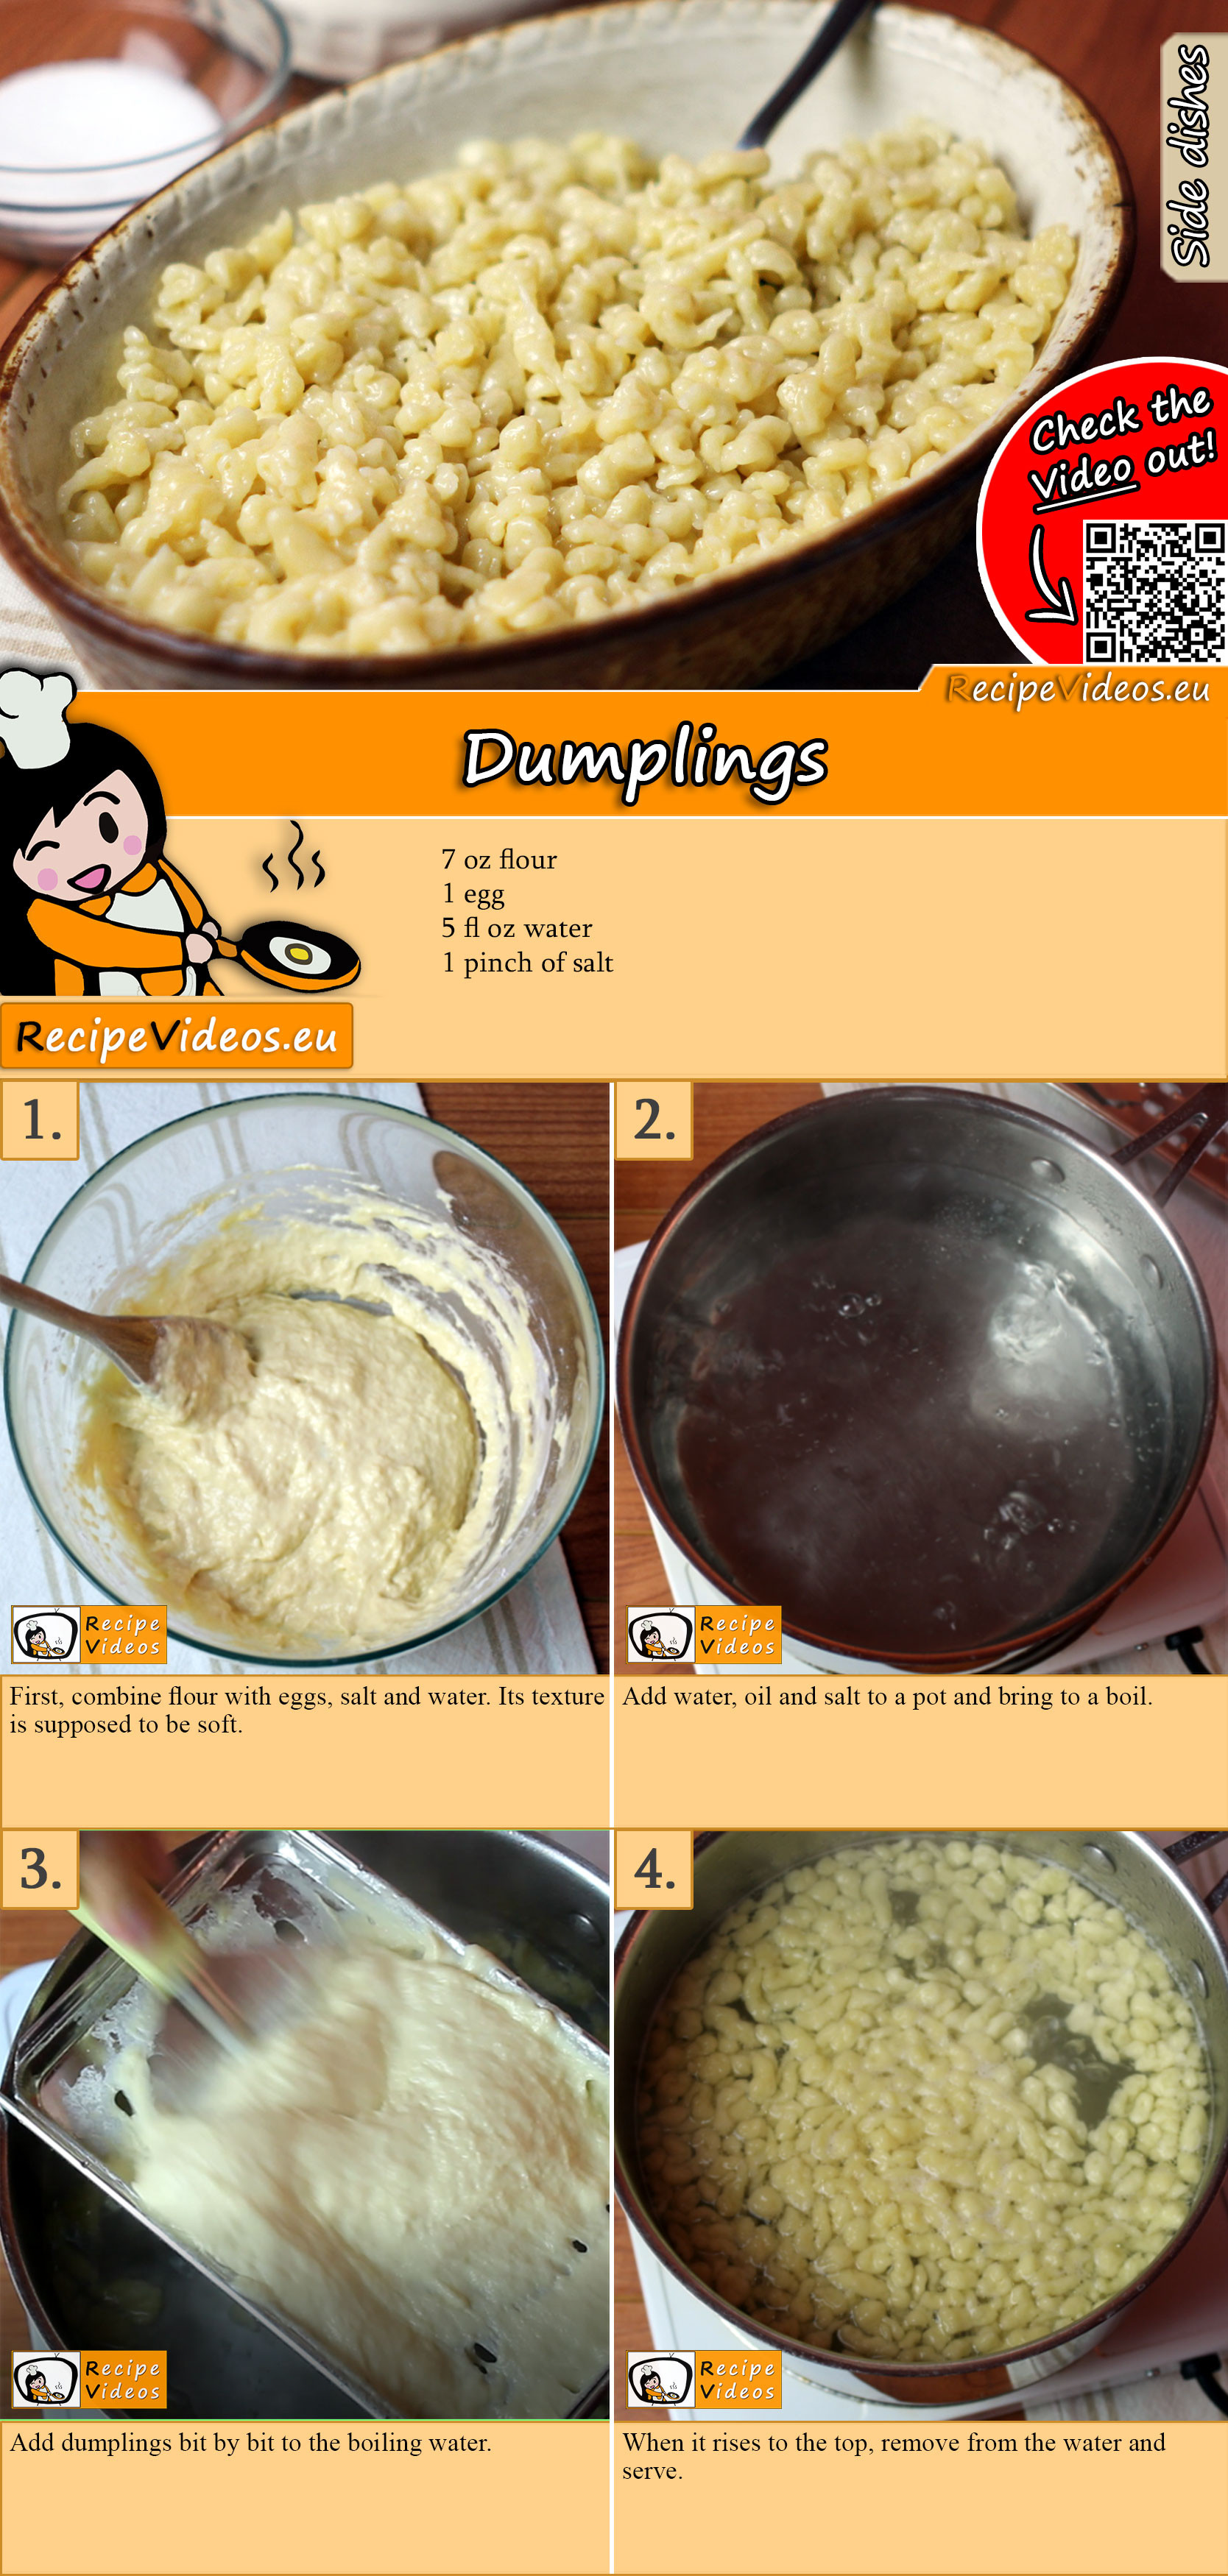 Dumplings recipe with video